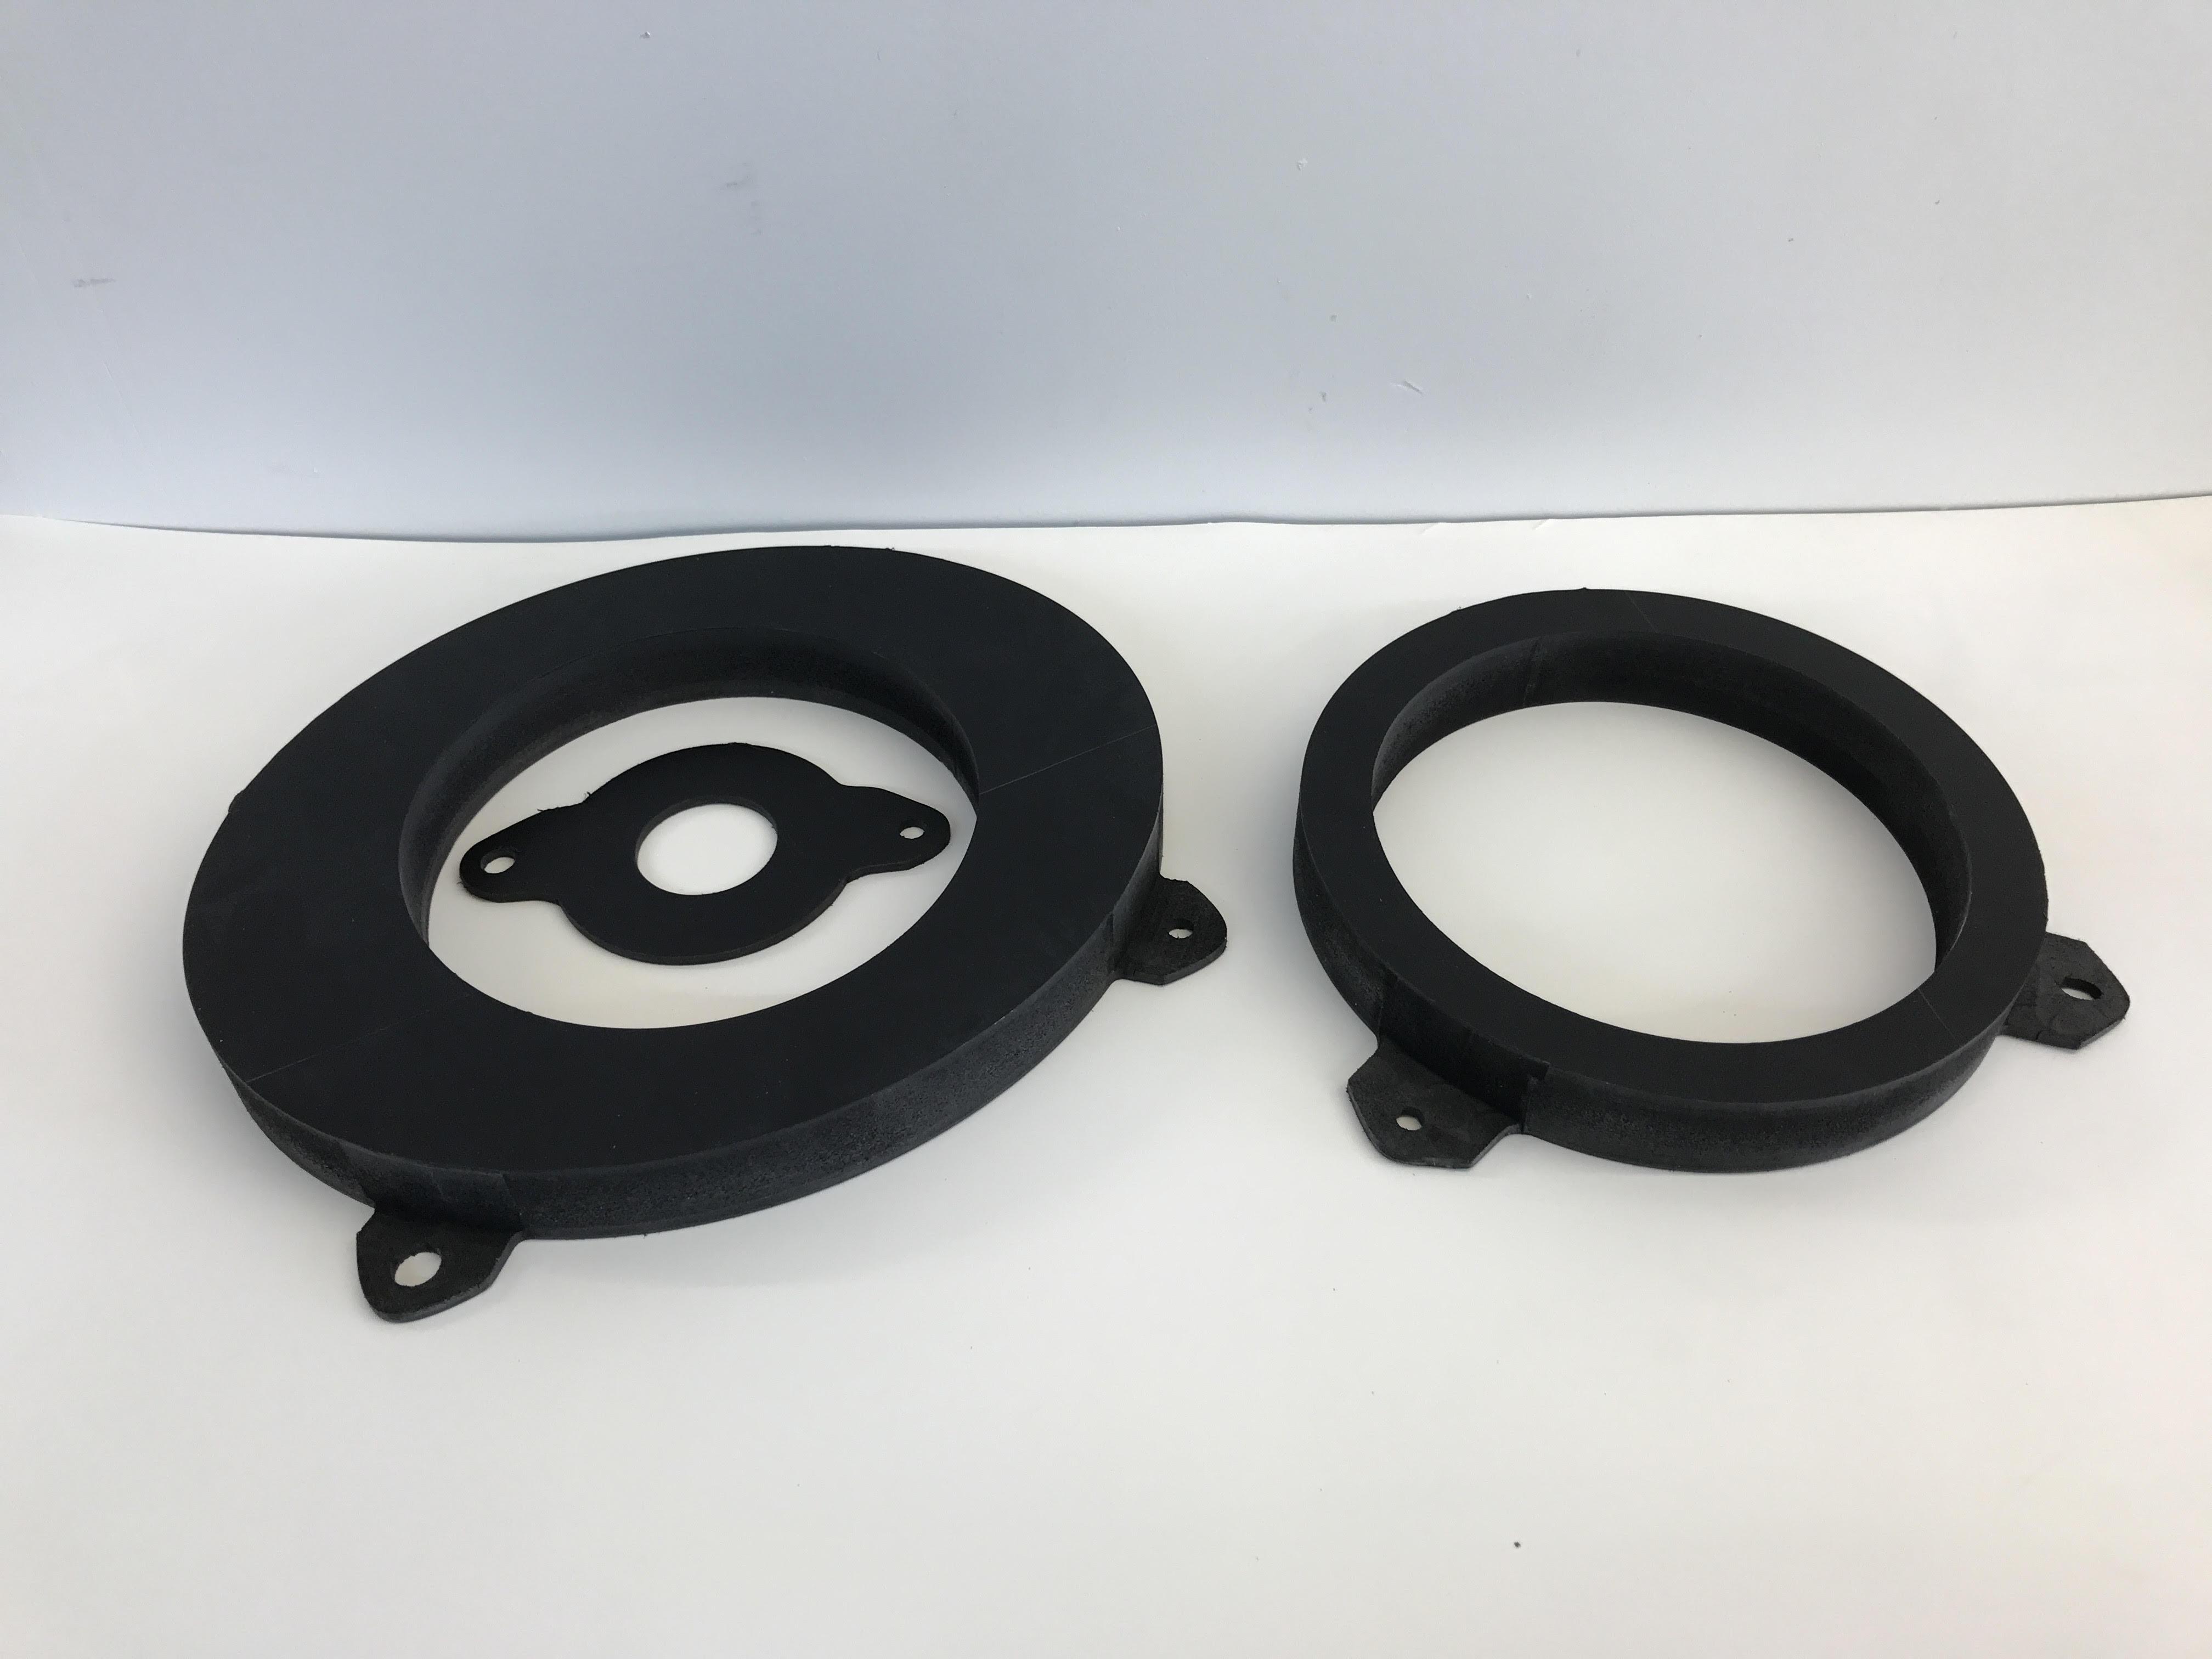 2018 2020 Toyota Camry Custom Speaker Adapters